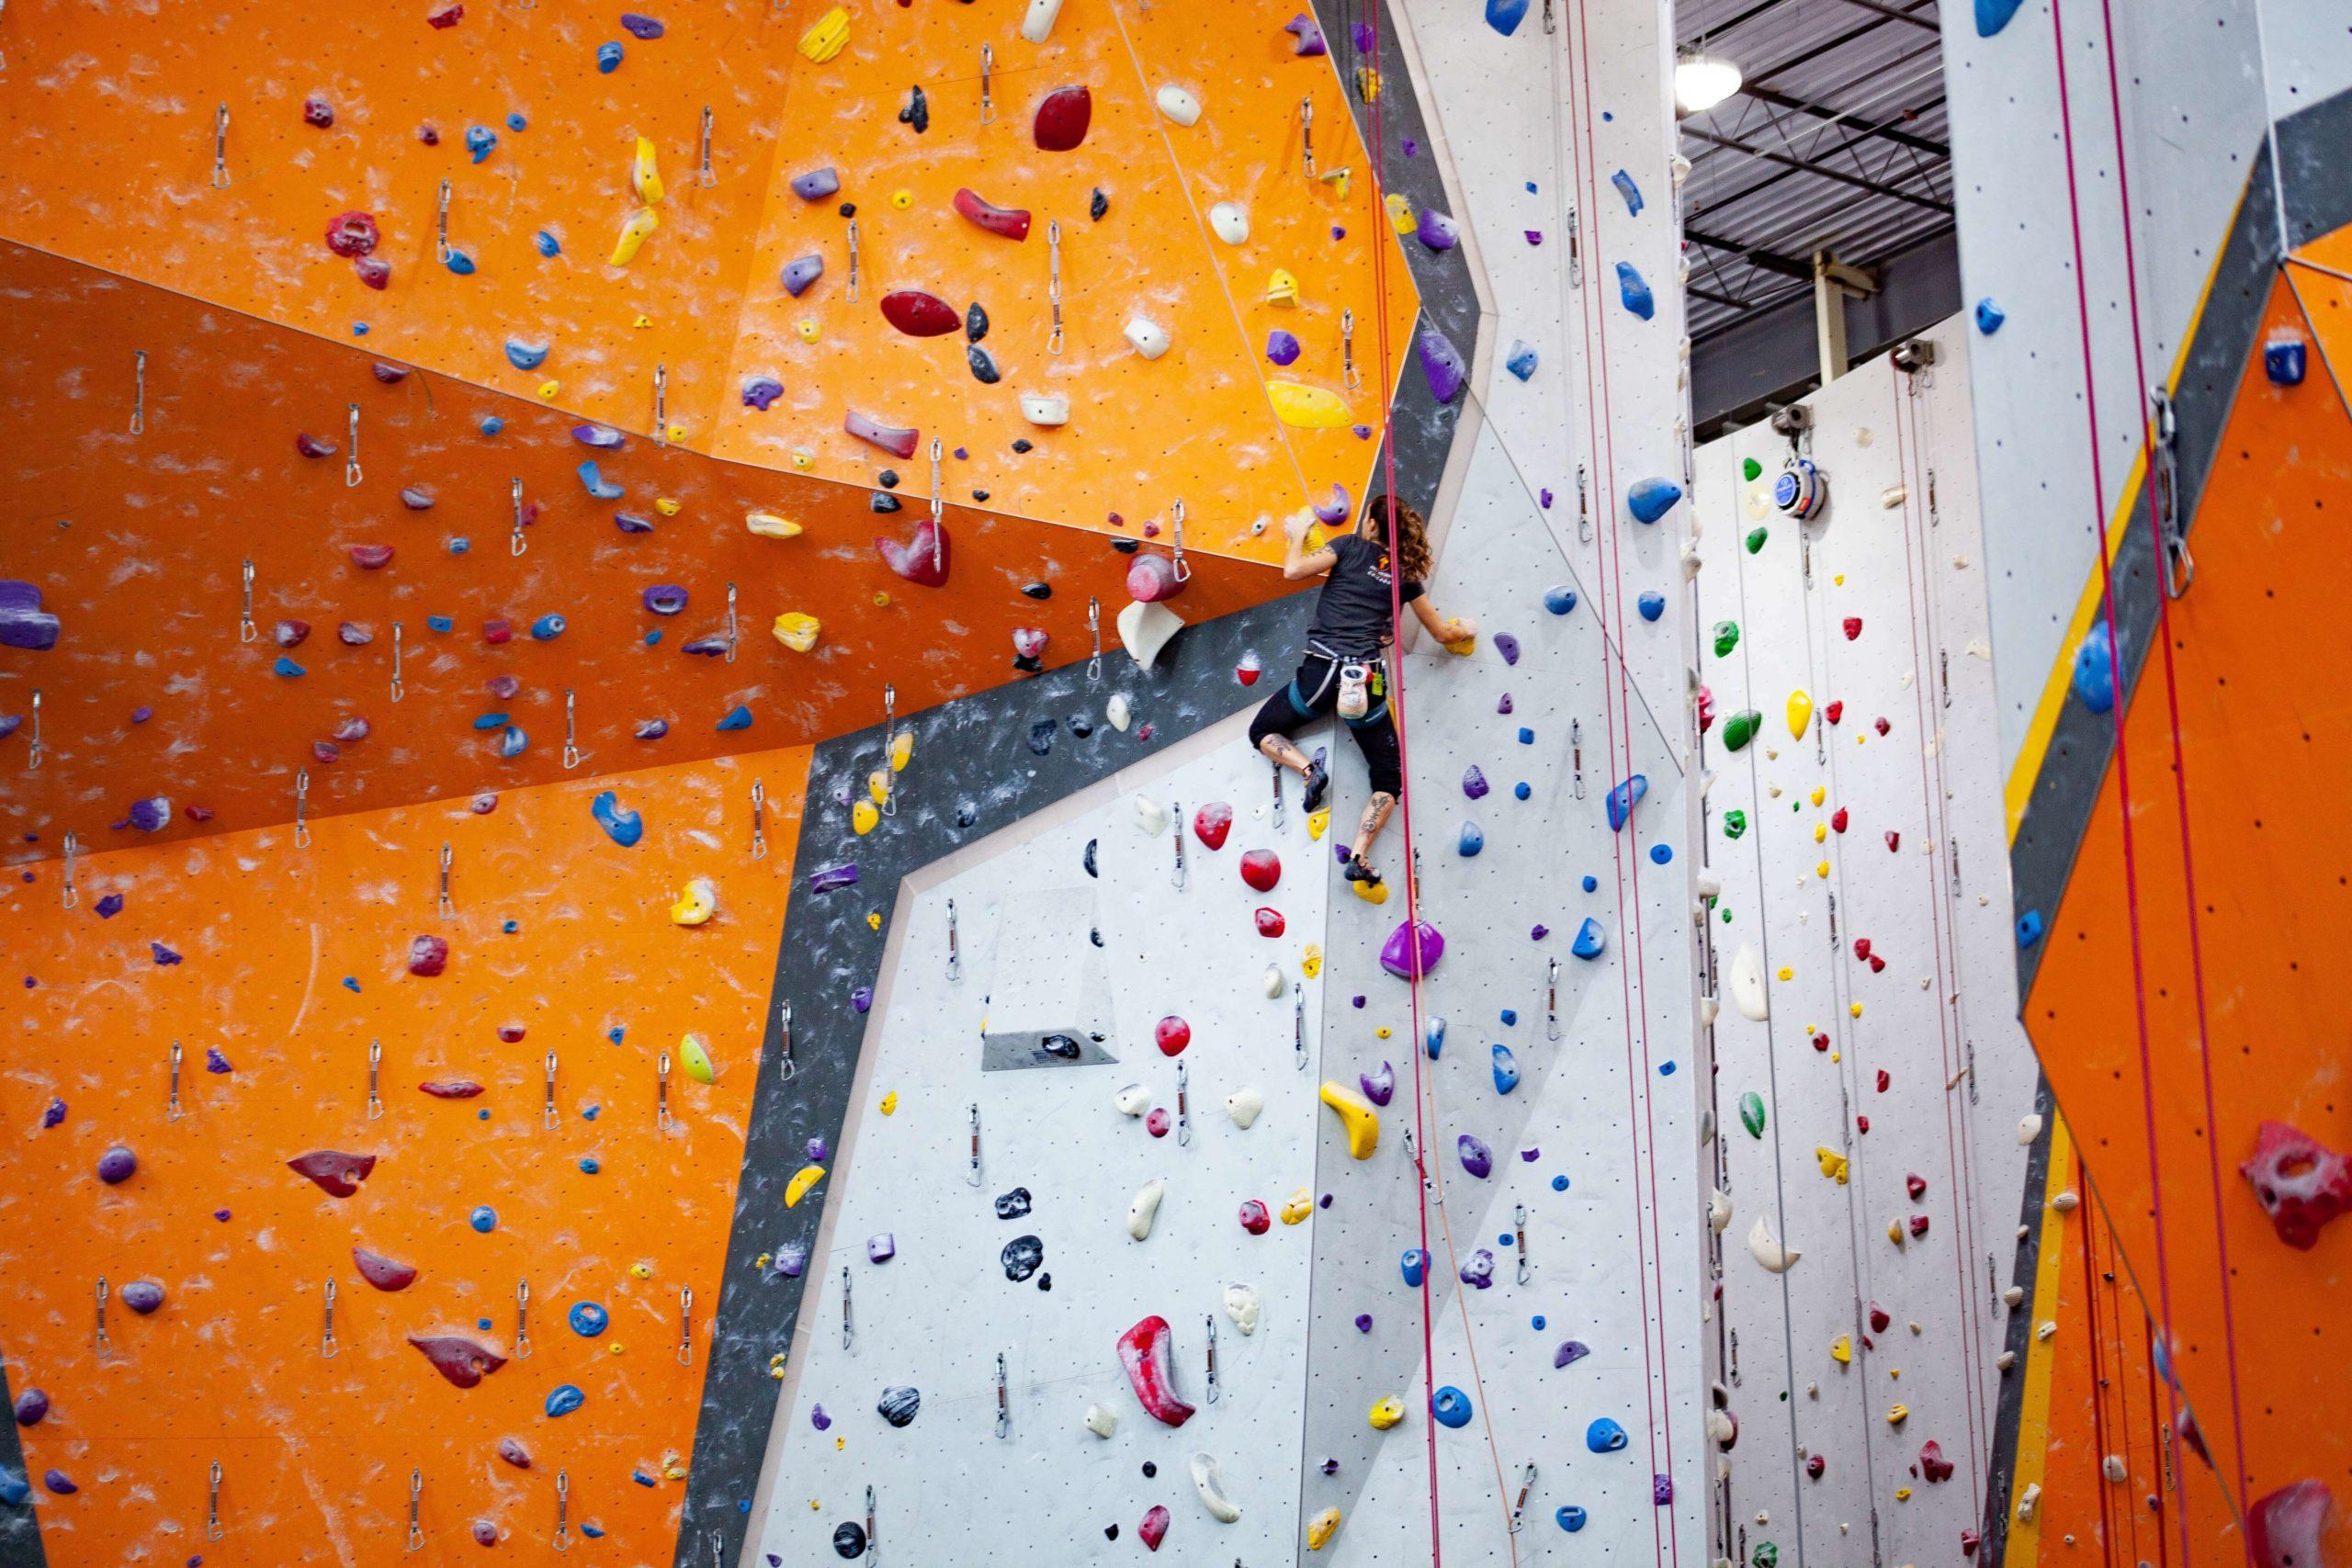 Olympic Wall Climbing